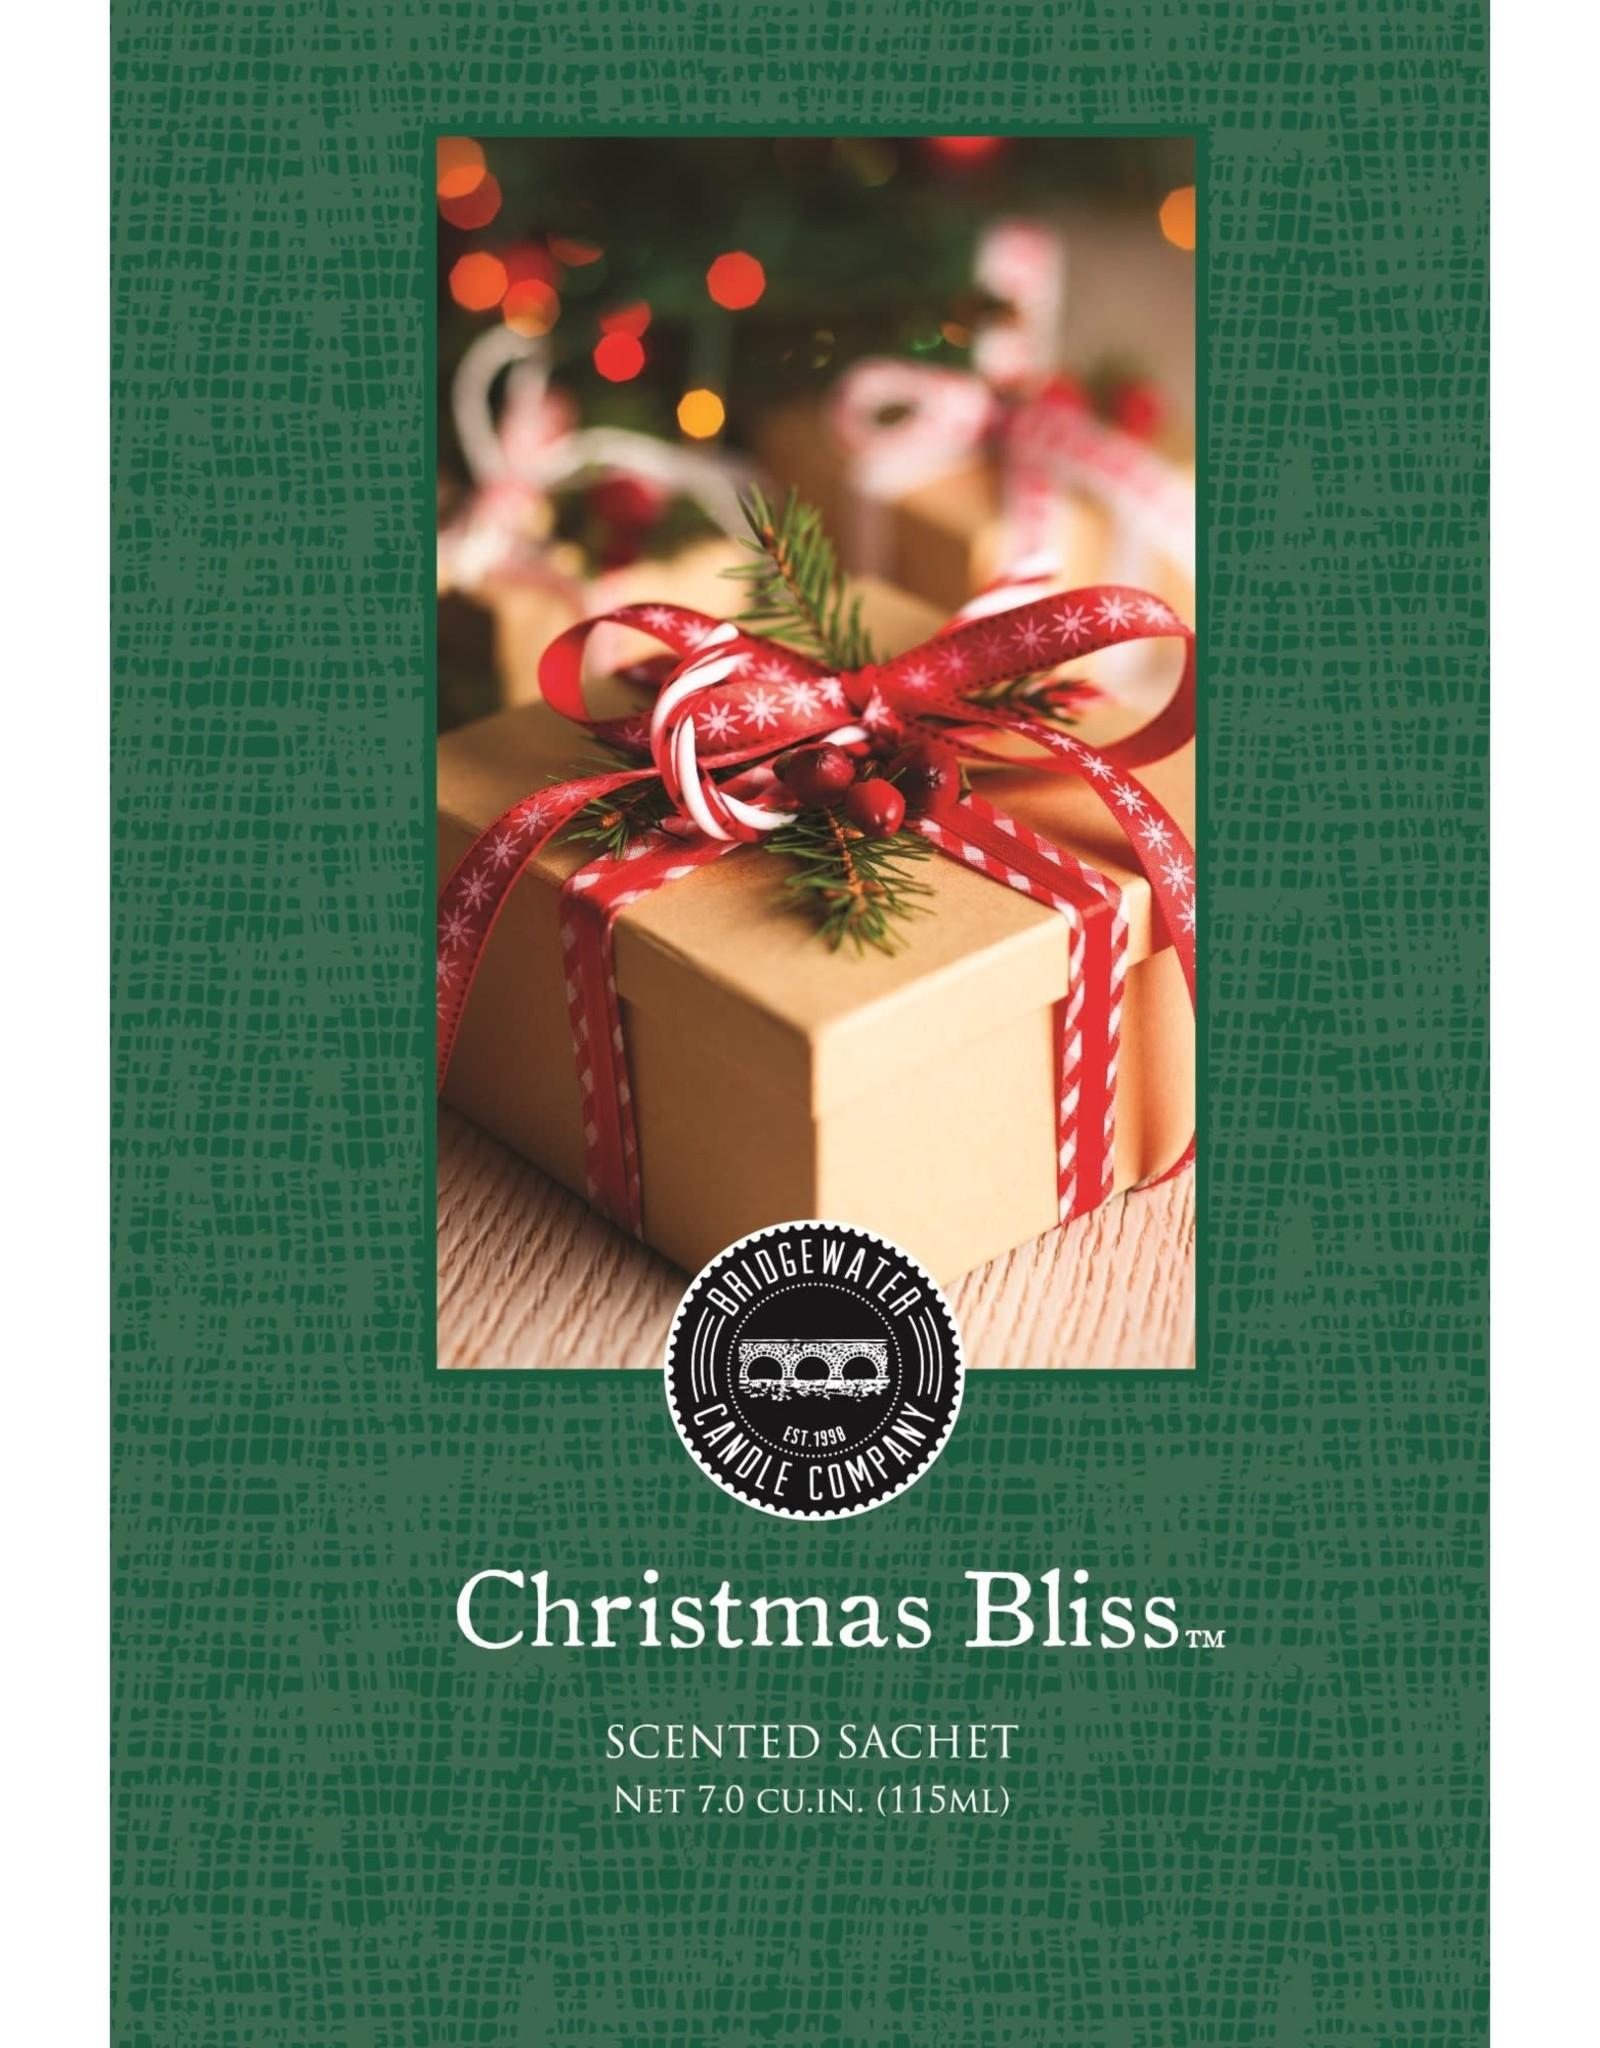 Parfum christmas bliss